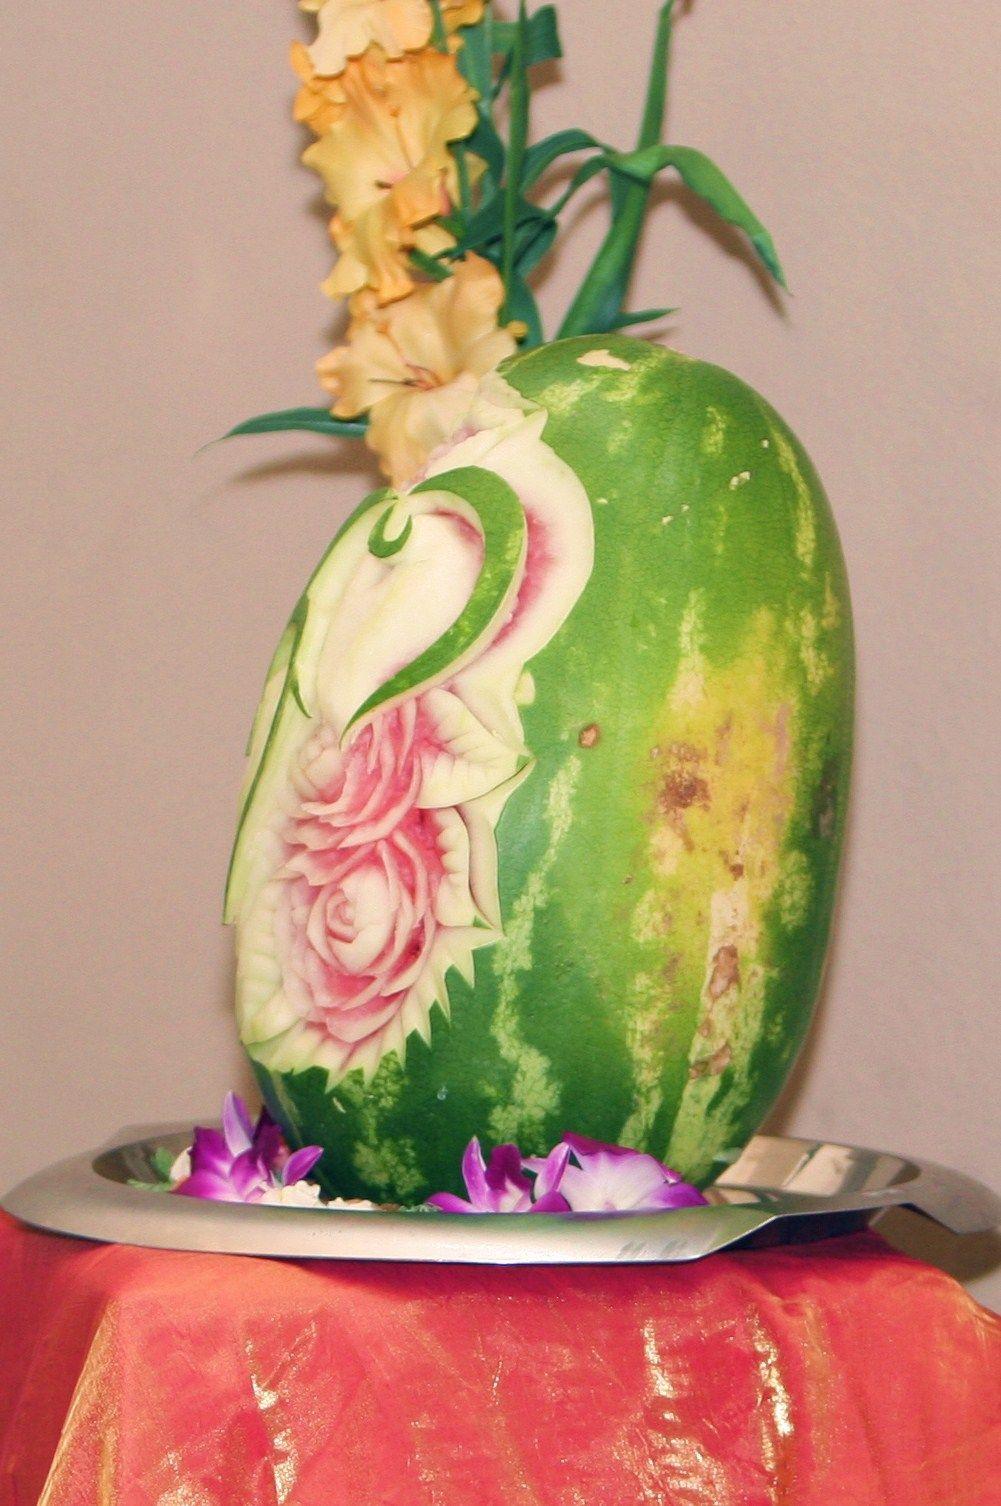 Wedding food table decor: carved fruit!